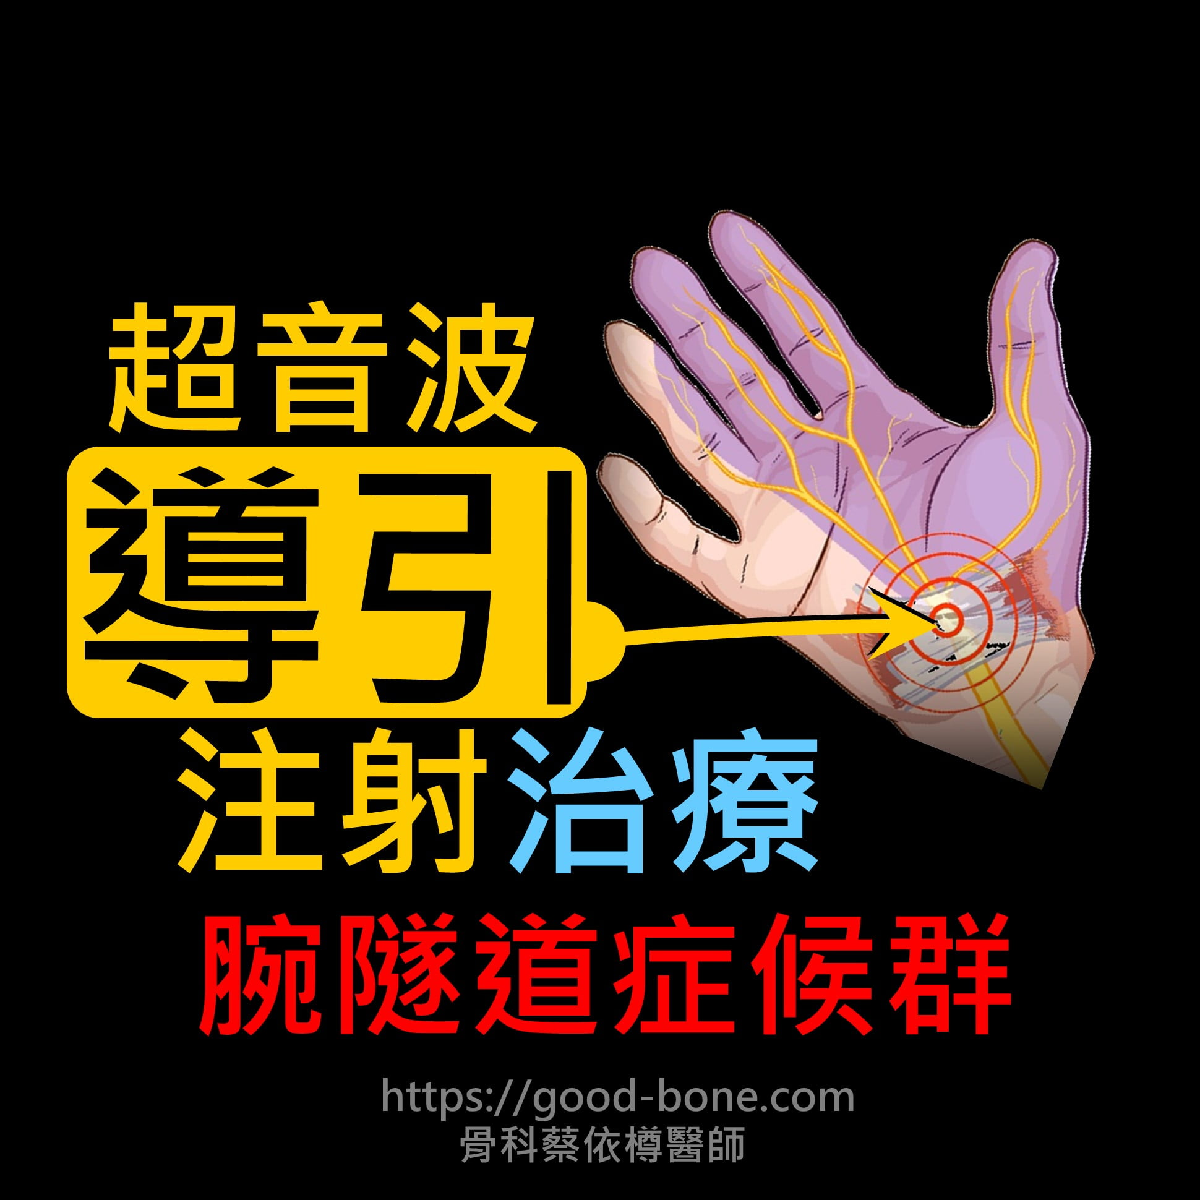 carpal tunnel syndrome, 腕隧道症候群,正中神經壓迫,超音波導引正中神經解套注射,治療前後比較,費倫測試、tinel sign, phalen test, median nerve compression neuropathy, 疼痛注射專家、超音波導引PRP增生治療、五十肩關節擴張注射治療、扳機指微創治療手術、網球肘、高爾夫球肘、媽媽手、膝蓋退化、專業骨科推薦|台中骨科蔡依樽醫師https://good-bone.com